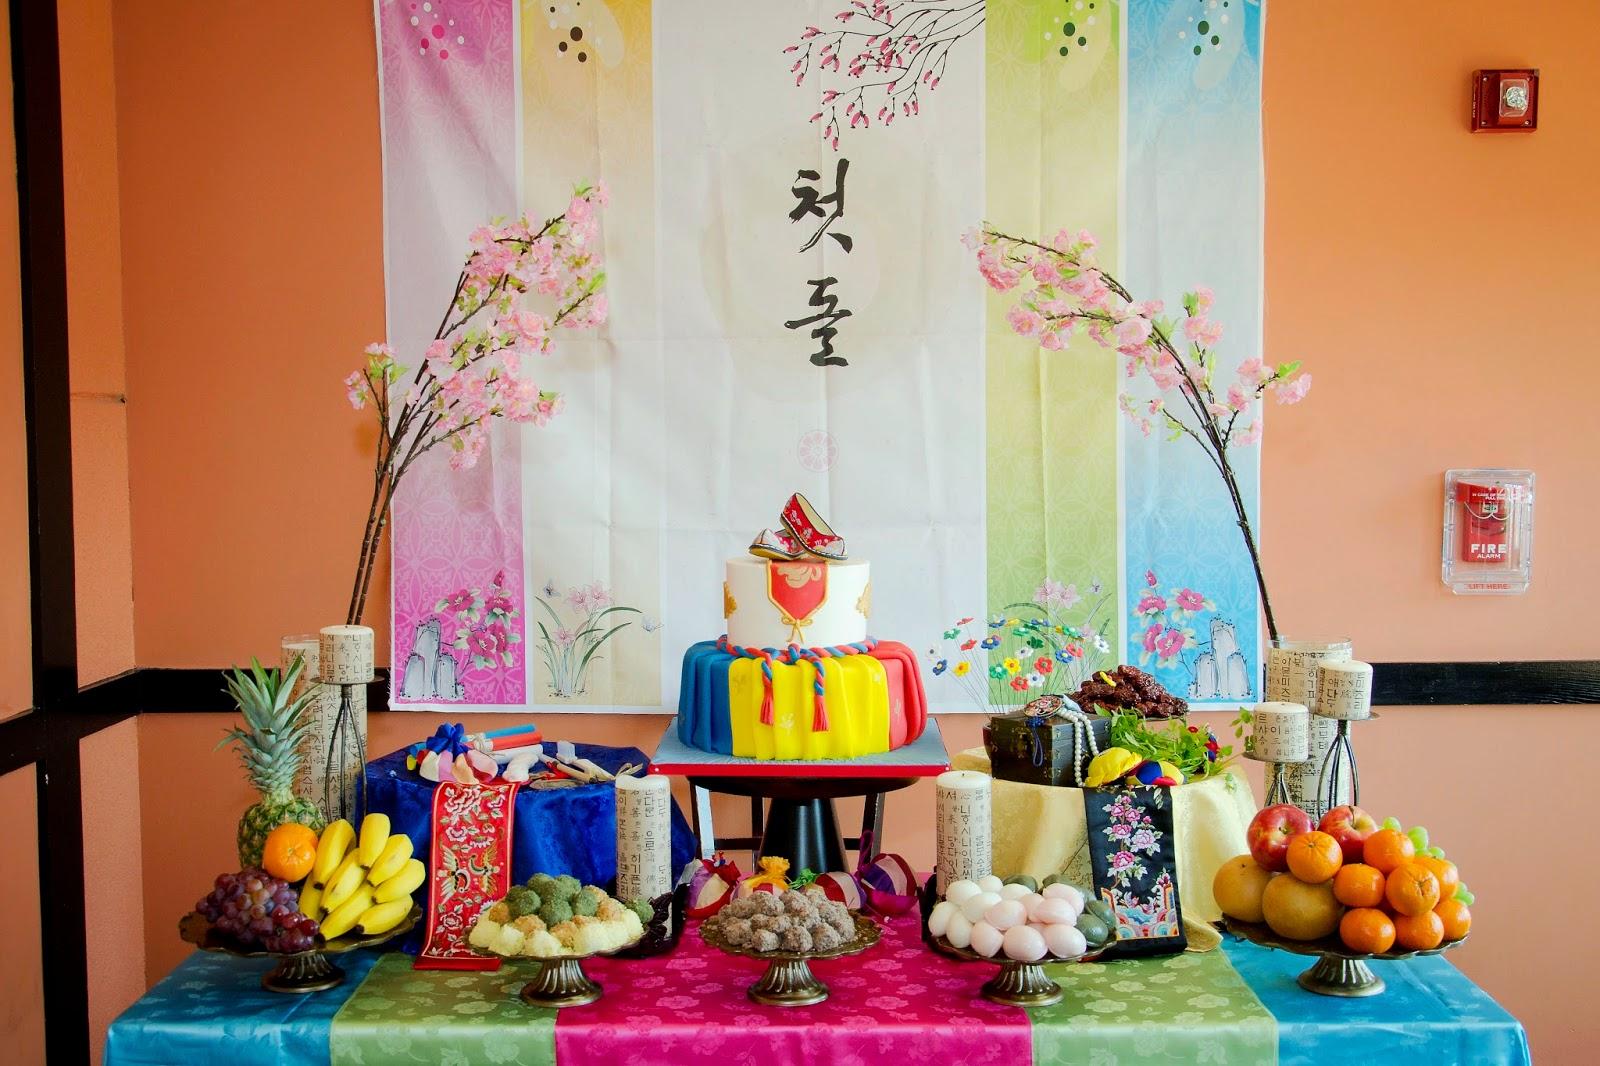 korean first birthday photography: a Korean first birthday table   all God's creations  korean first birthday